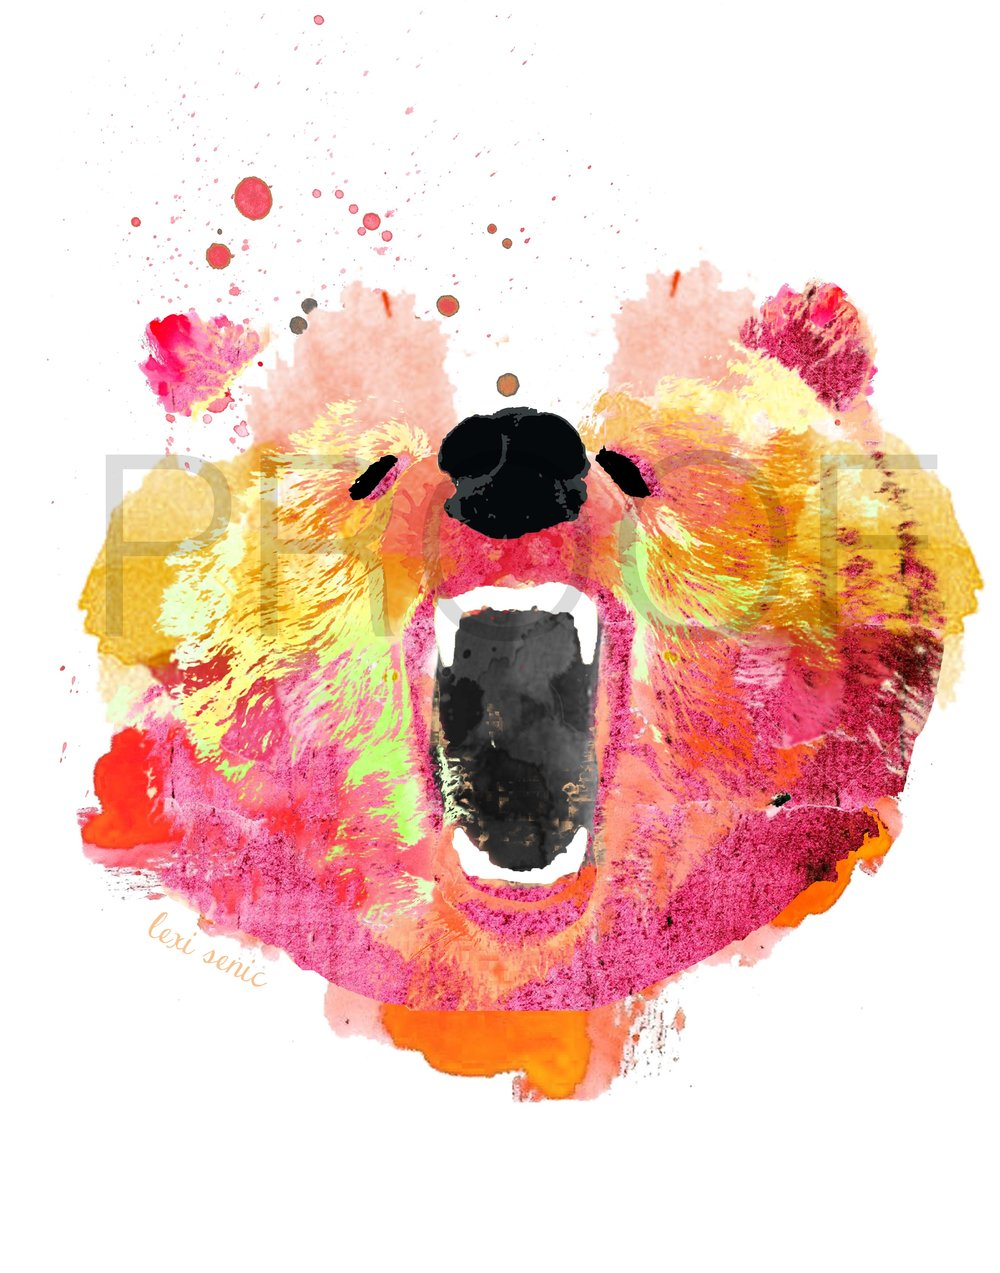 roaring-bear-proof.jpg